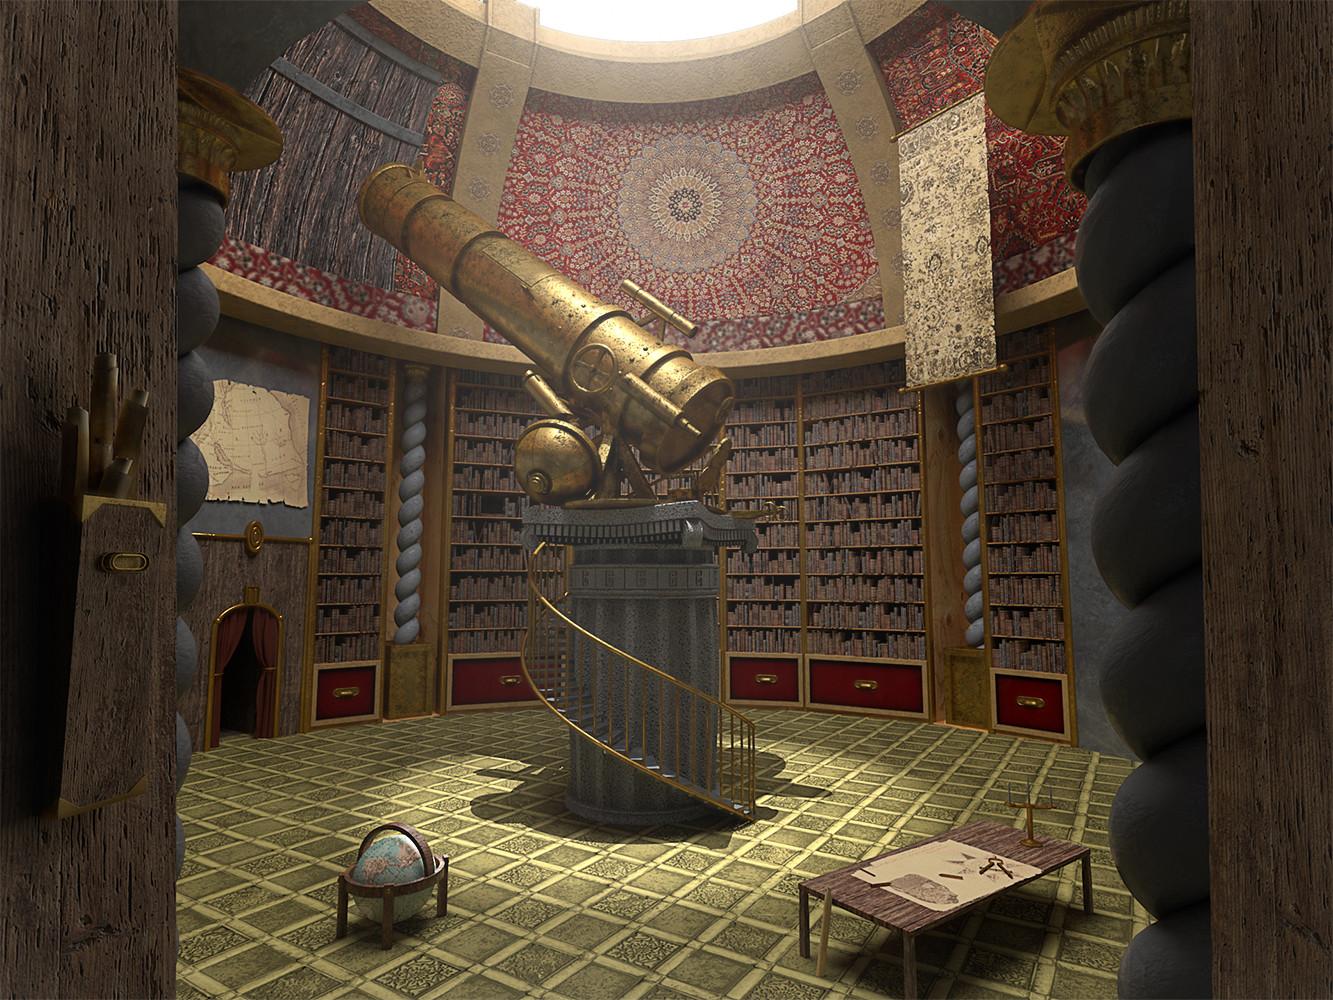 Observatory Room